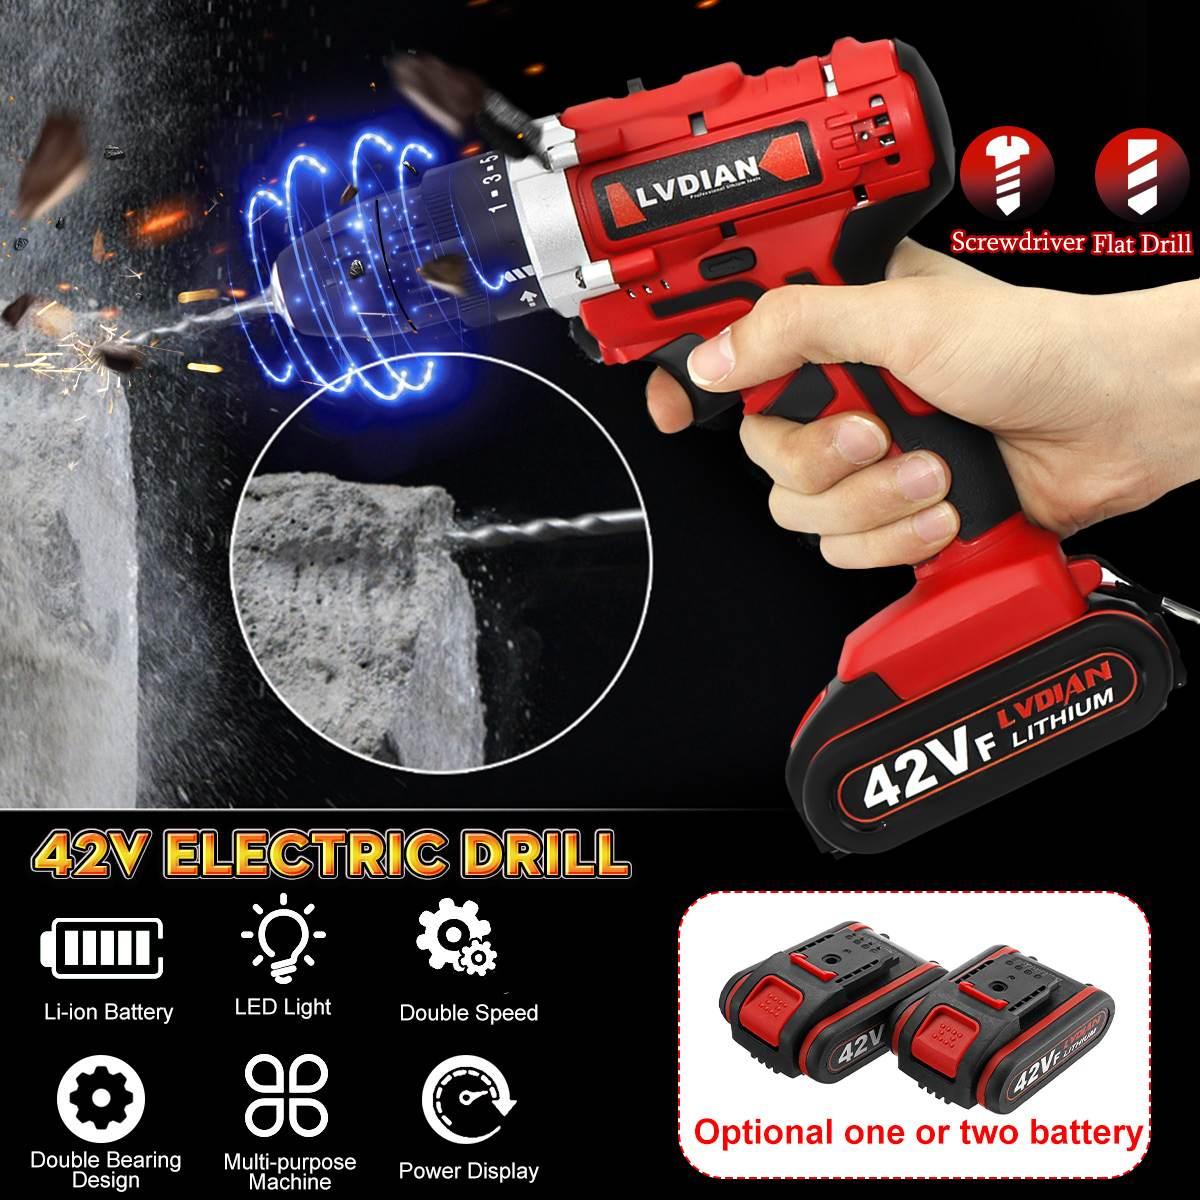 42V 110-240V Electric Cordless Drill Screwdriver 25+1 Torque LED Work Light w/ 2 Battery 10.5x7.5x20.5cm Duplex Bearing42V 110-240V Electric Cordless Drill Screwdriver 25+1 Torque LED Work Light w/ 2 Battery 10.5x7.5x20.5cm Duplex Bearing